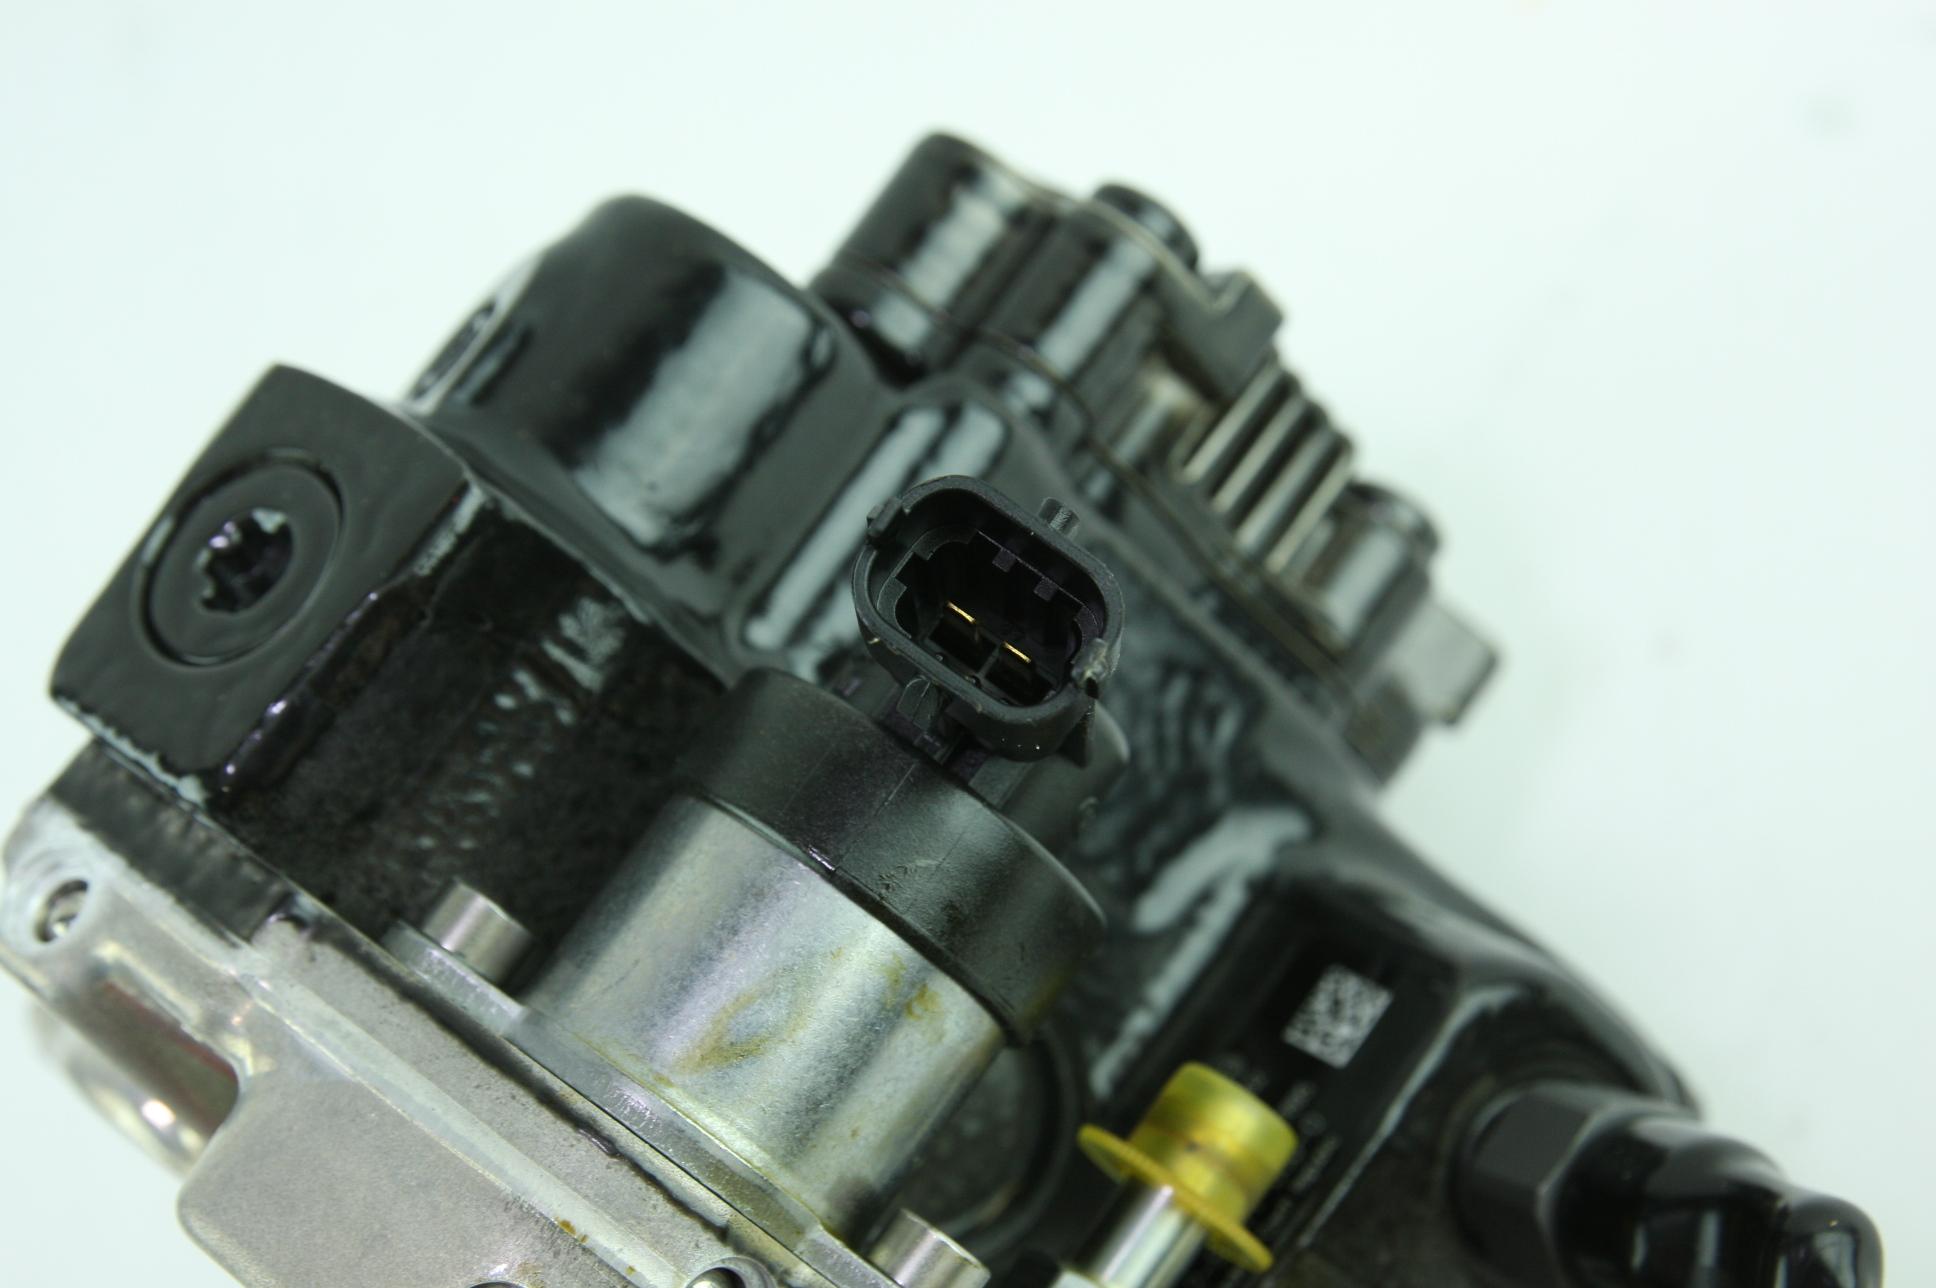 New Genuine OEM GM 97780161 Reman Injection Pump w/ Regulator 06-10 Duramax 6.6 - image 4